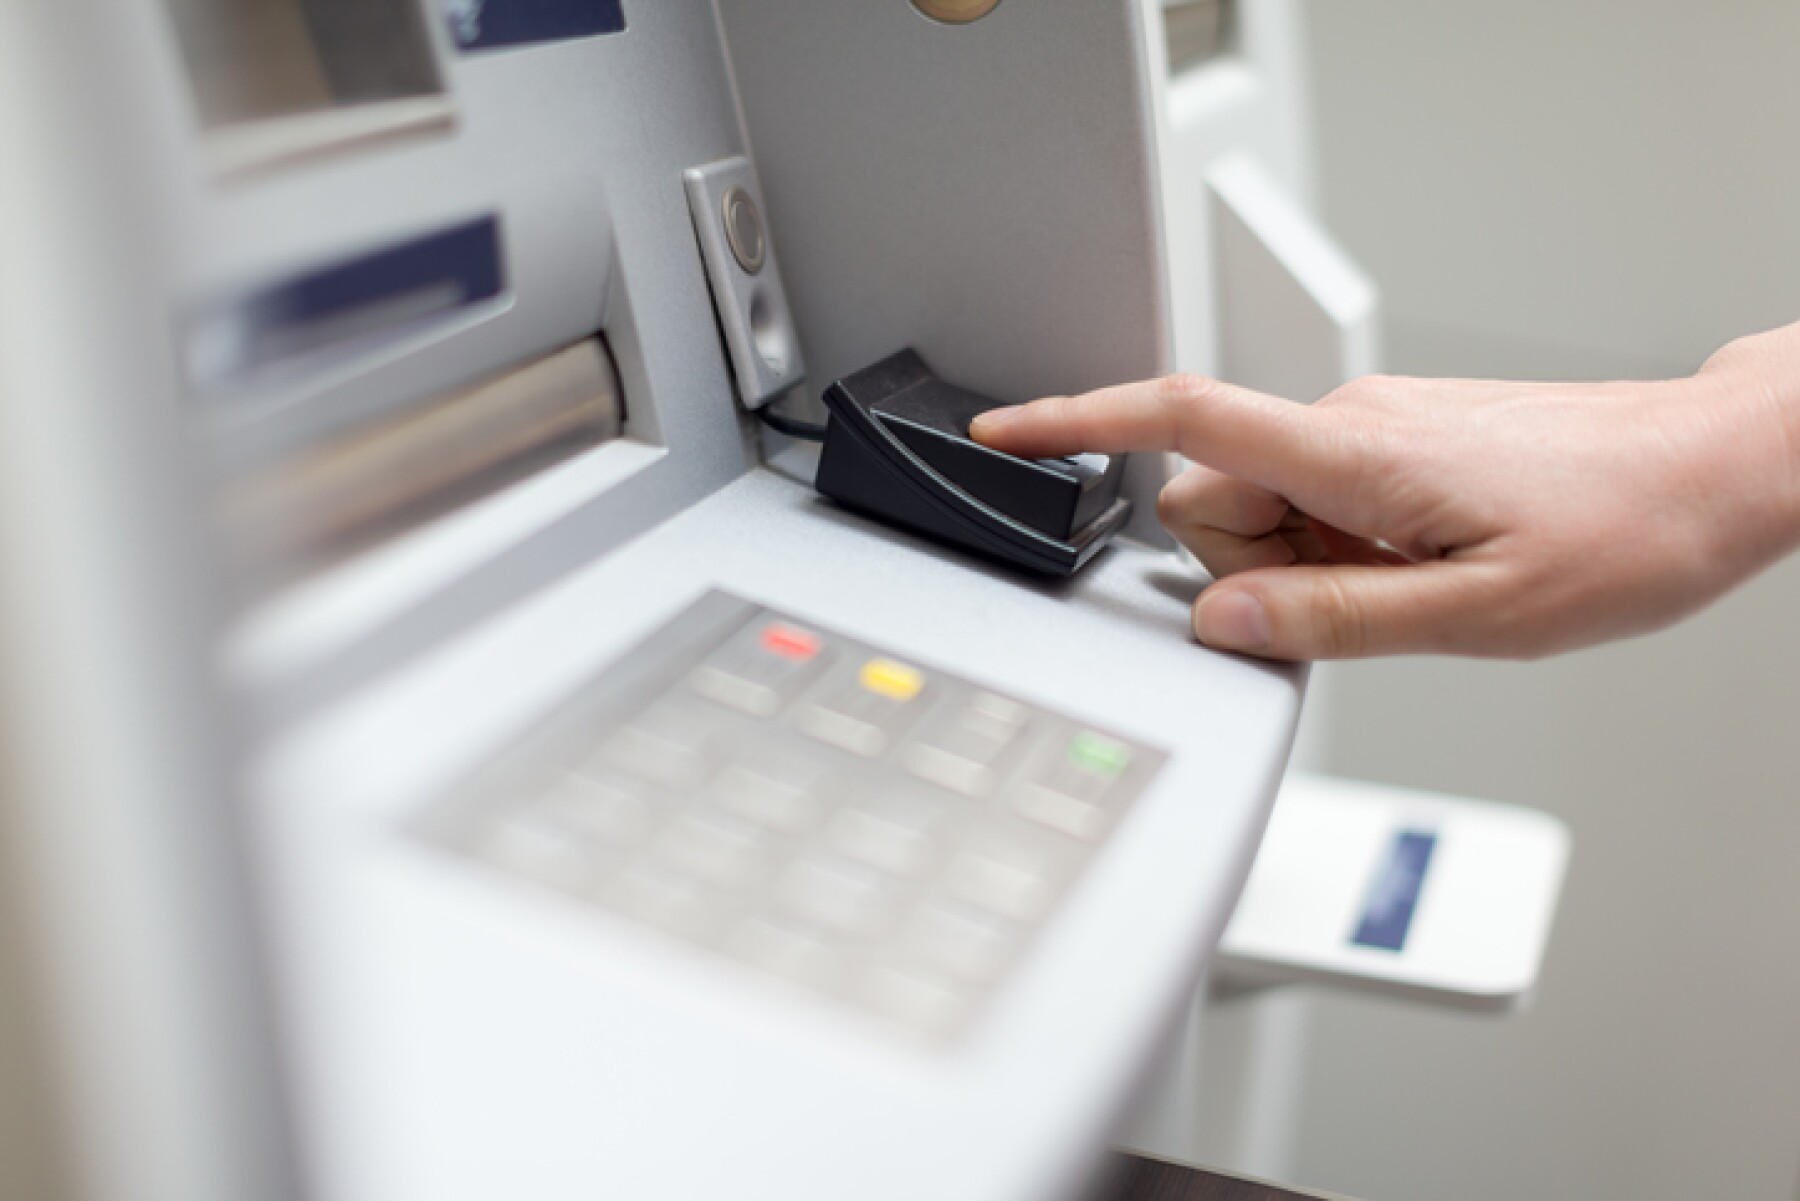 Fingerprint recognition technology on ATM